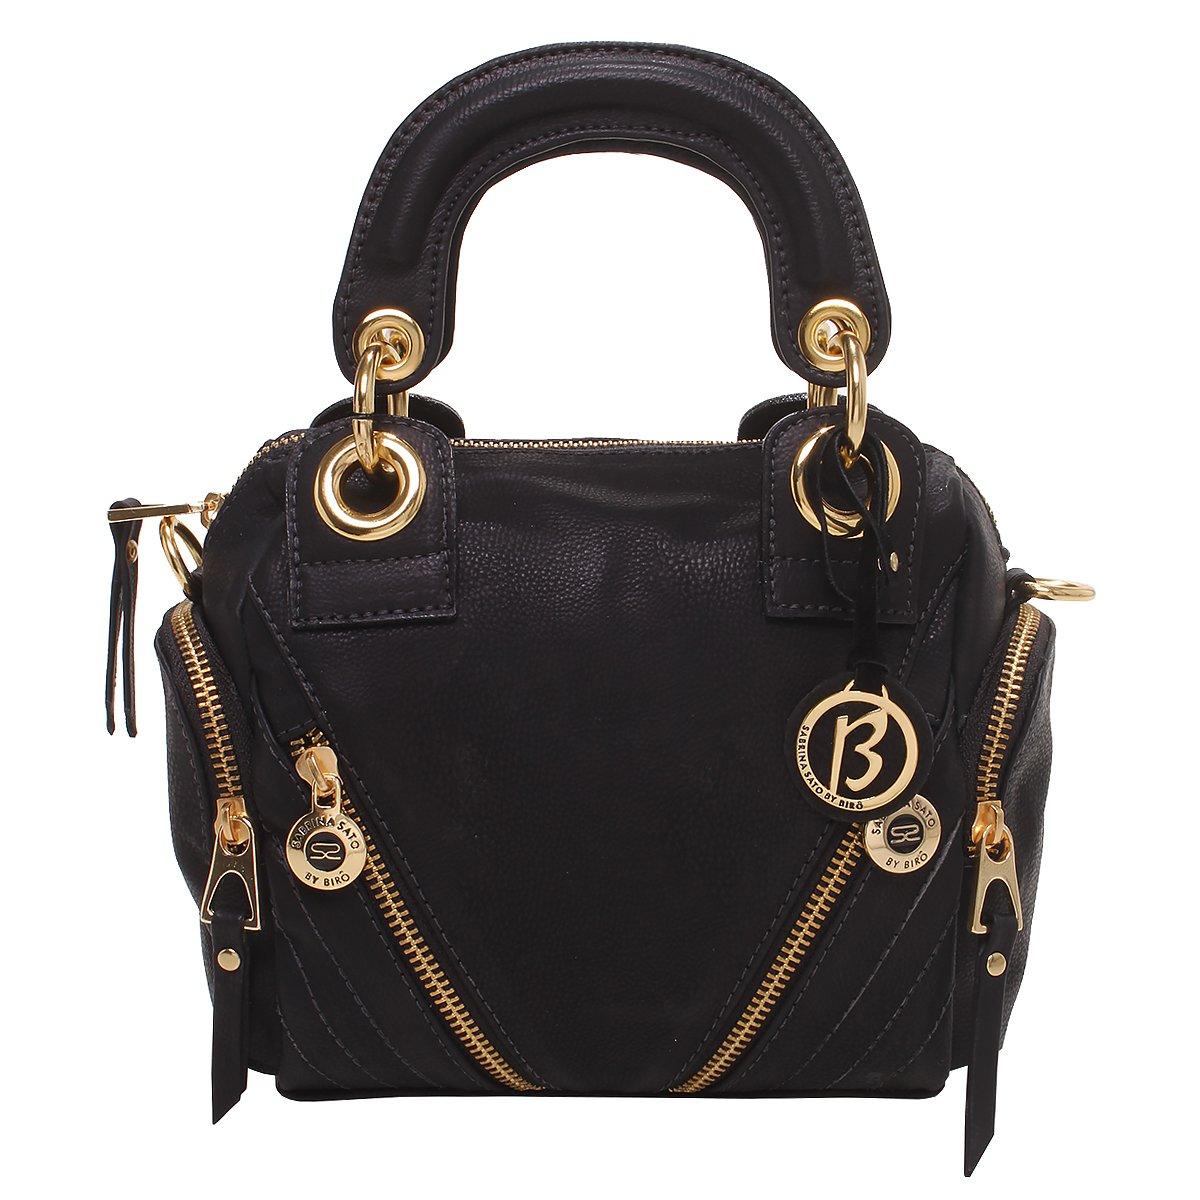 62f2d7cabb24c Bolsa Birô Min Bag Sabrina Sato - Compre Agora